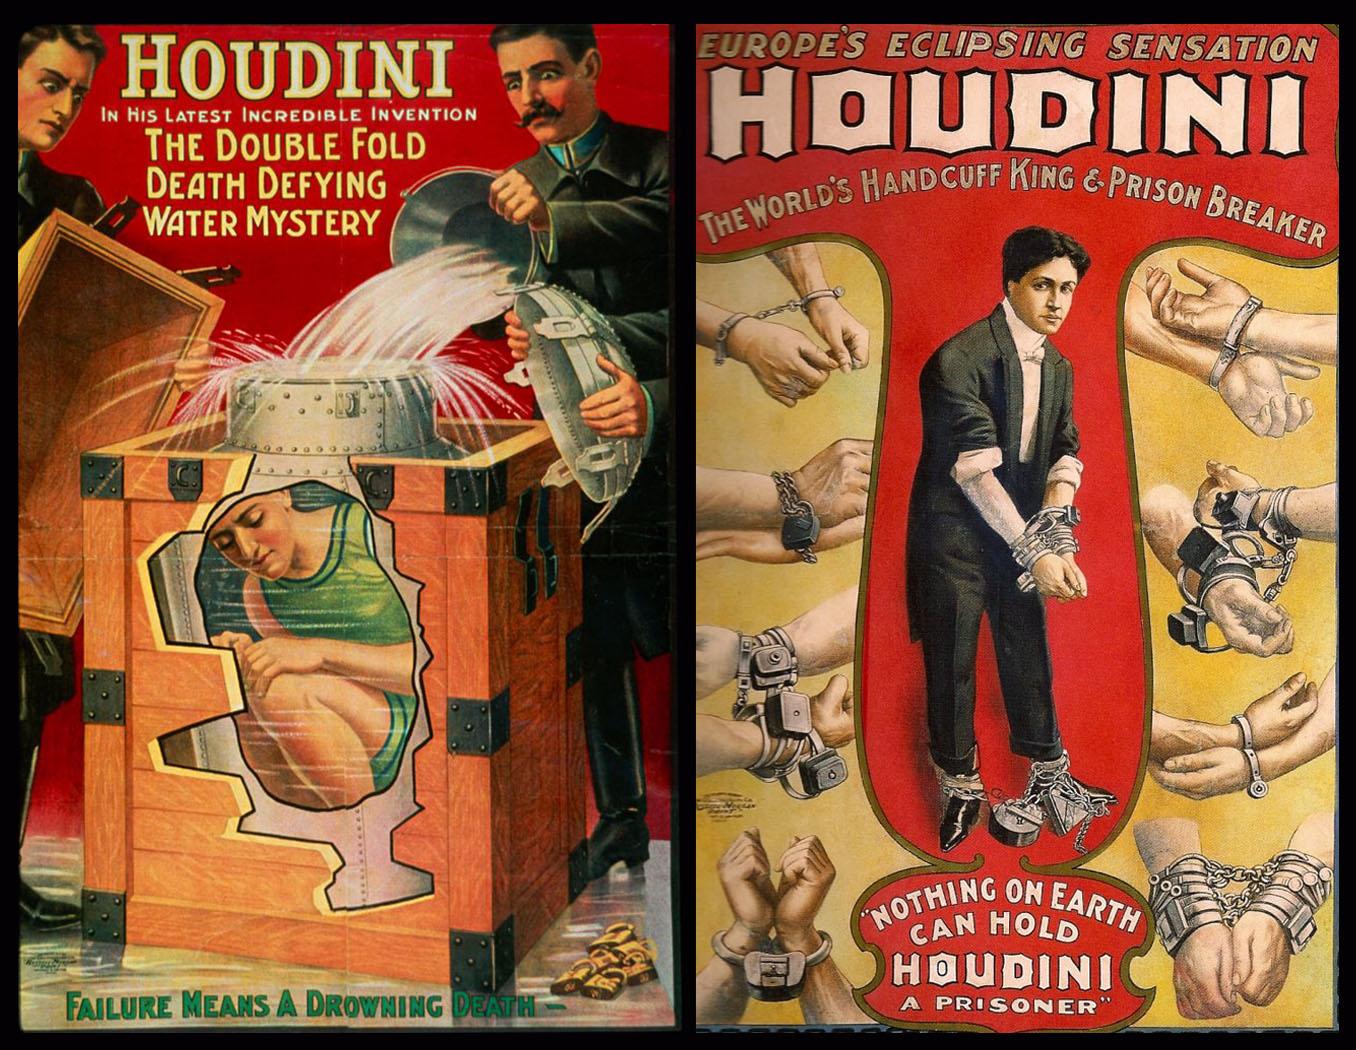 Houdini's Workshop